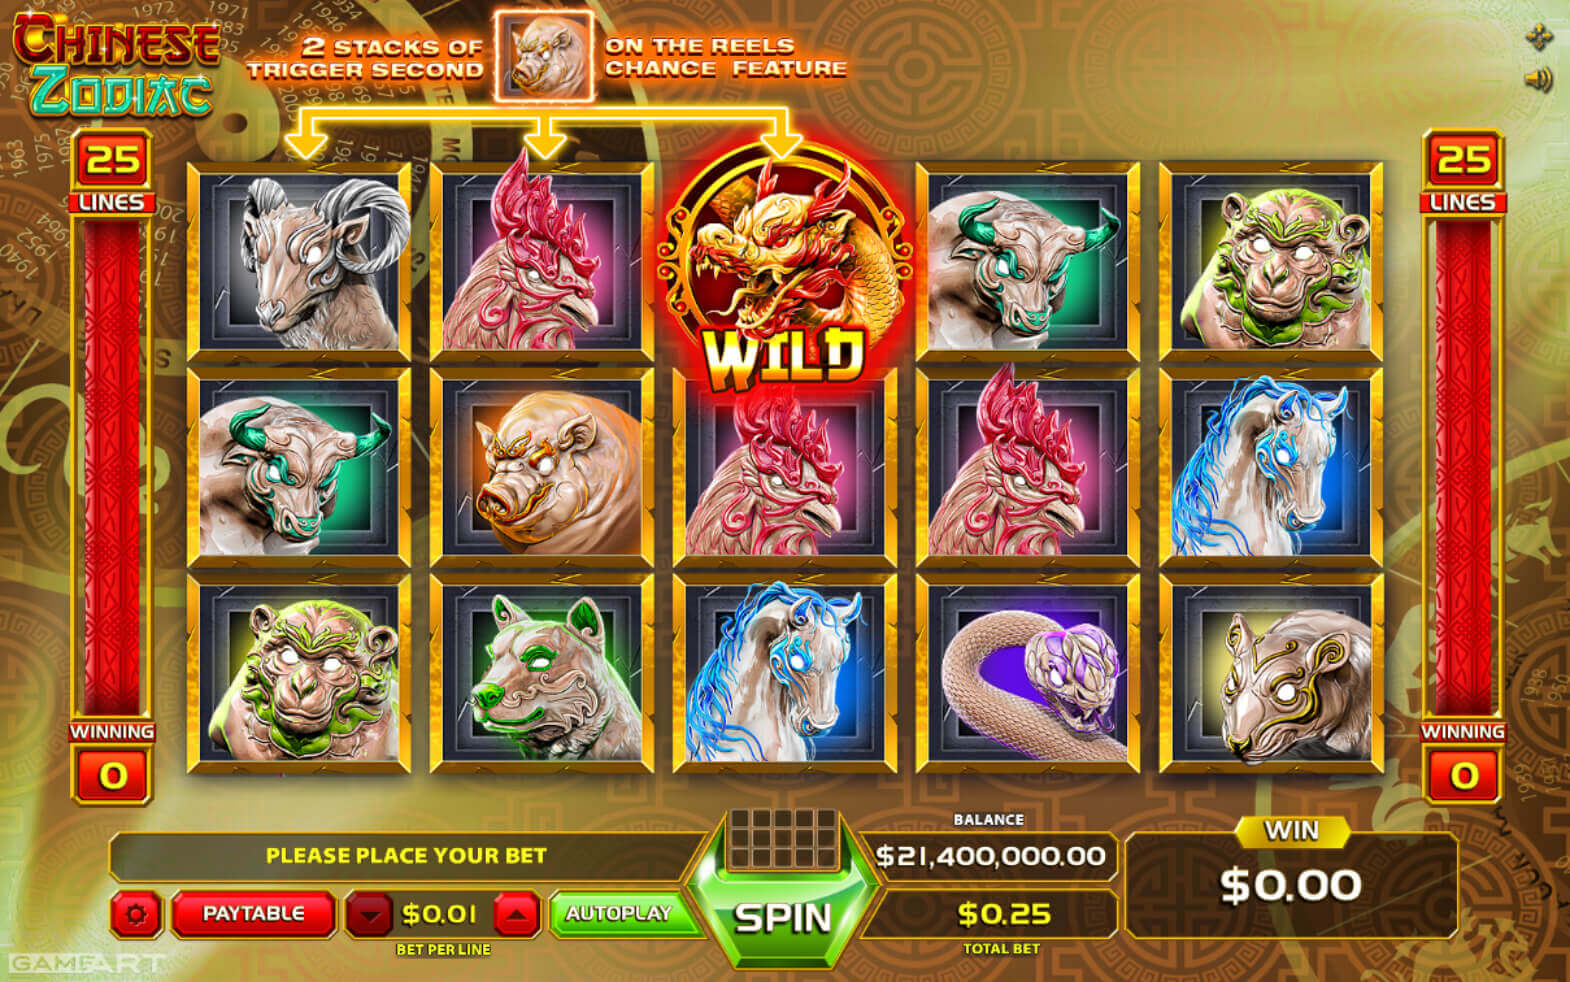 Deposit fortnite chinese zodiac slot machine online gameart head manager